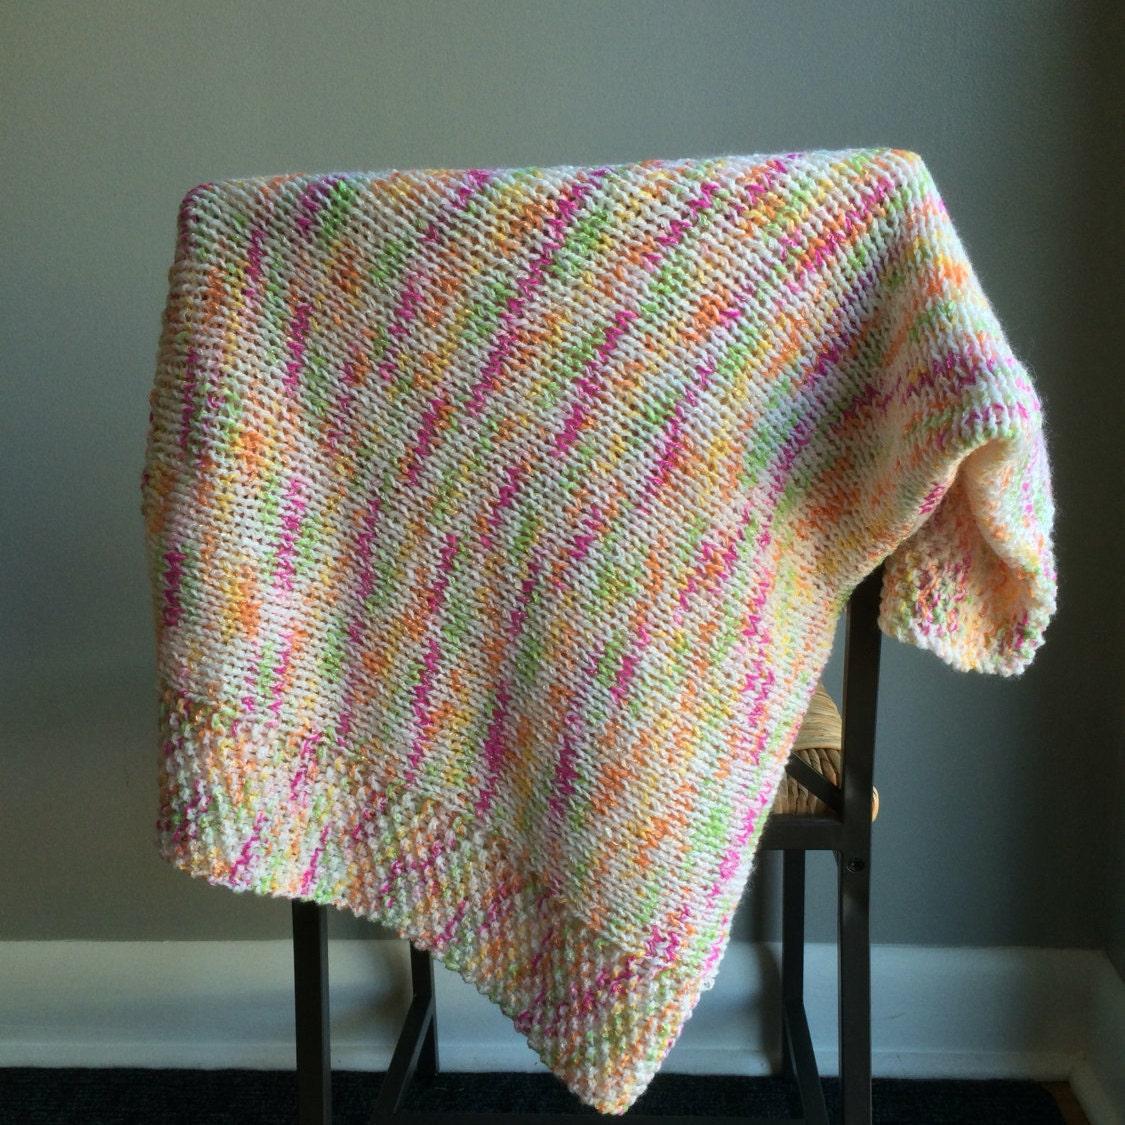 Sale Knit Baby Blanket Ready To Ship Baby Blanket Knit Boho Baby